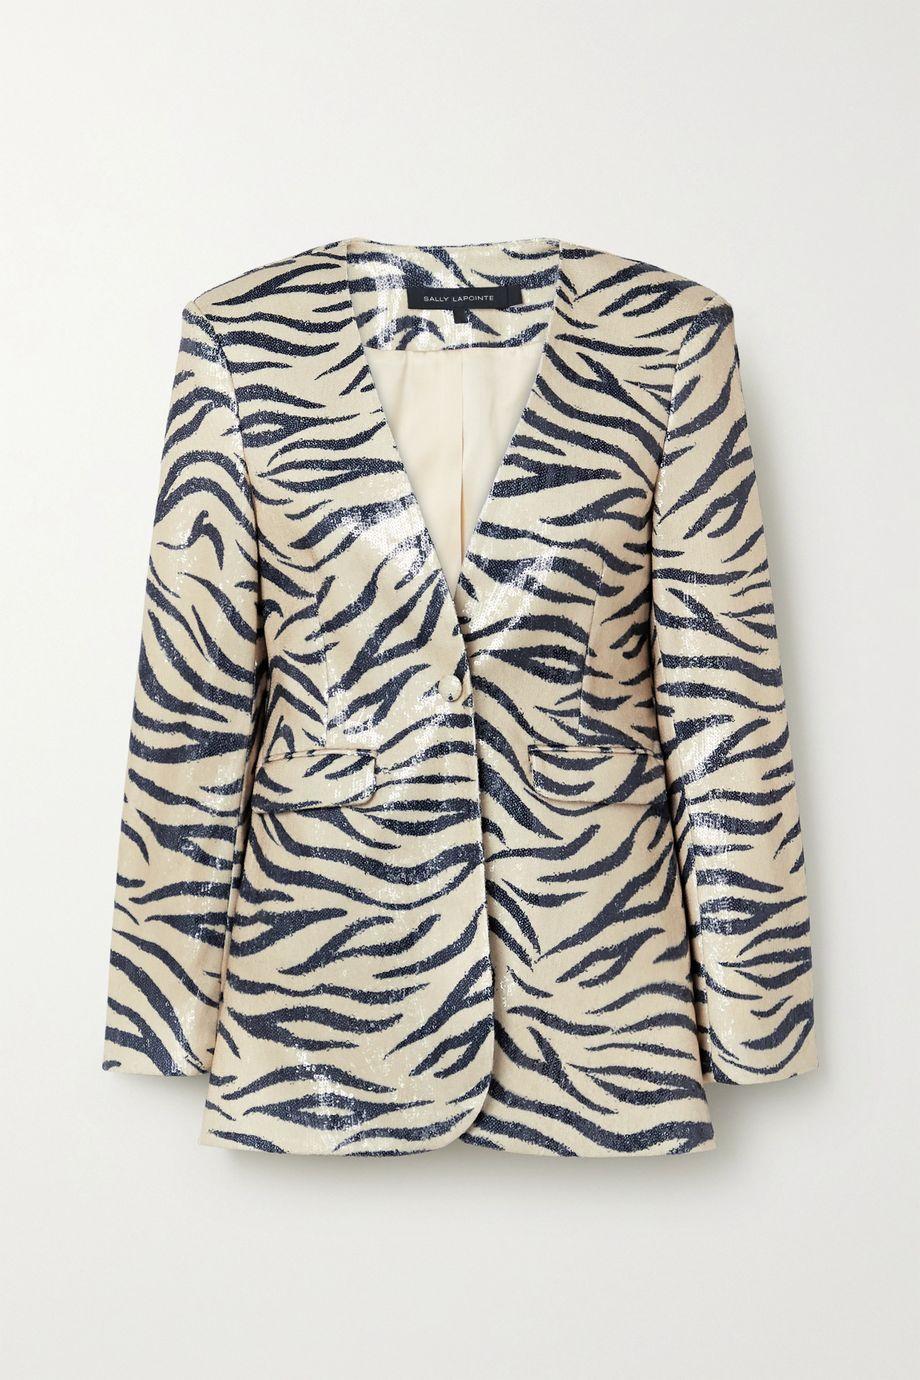 LAPOINTE Zebra-print sequined woven blazer